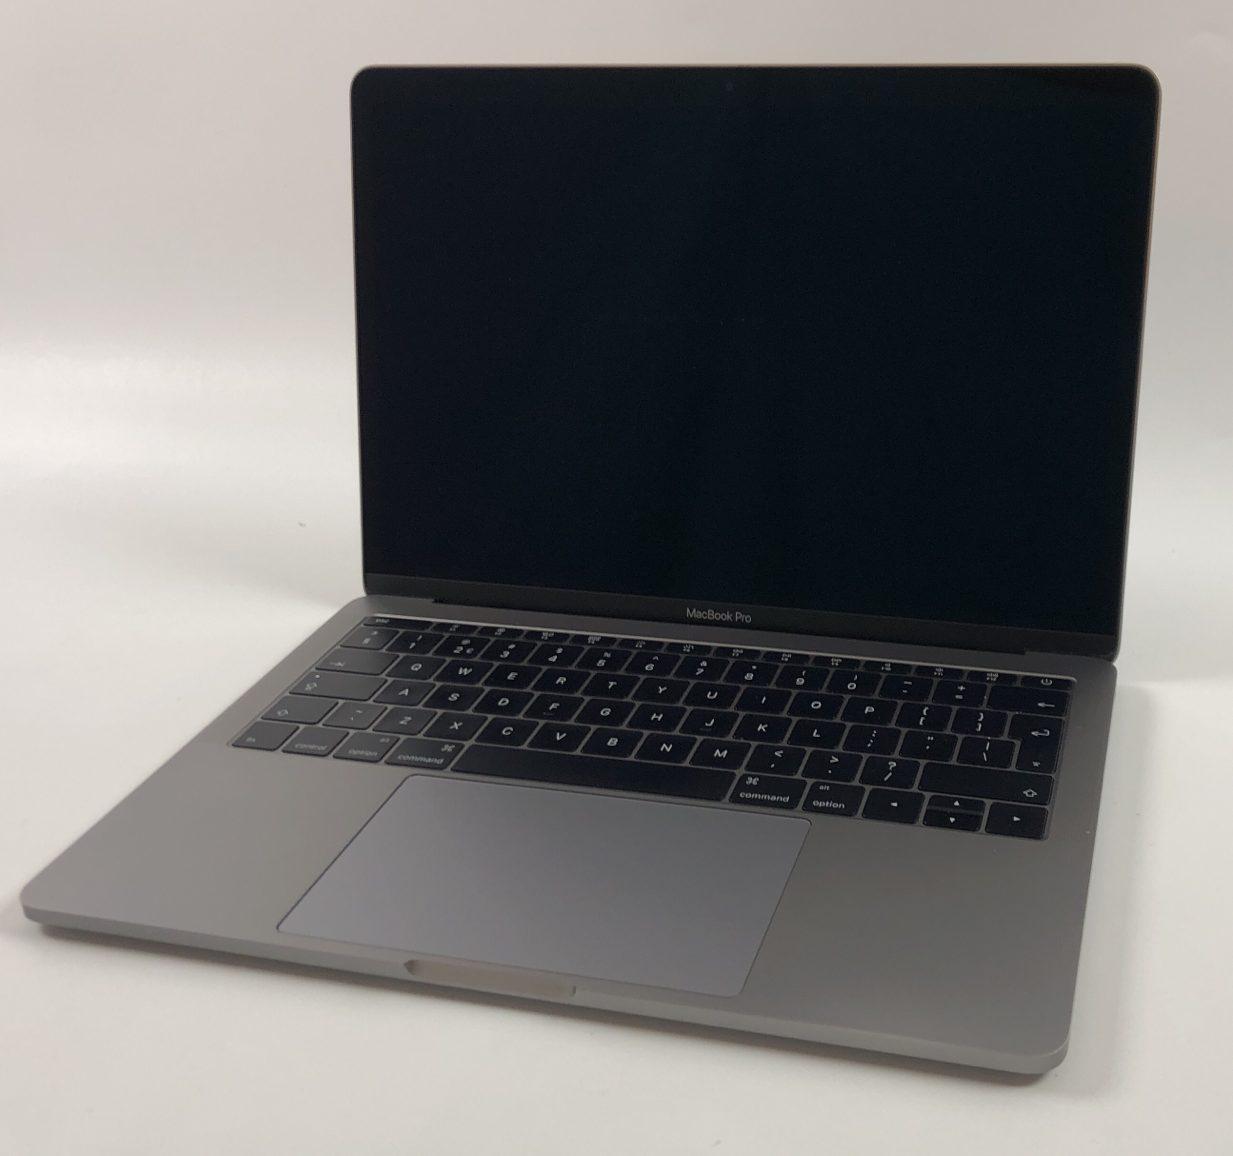 "MacBook Pro 13"" 2TBT Late 2016 (Intel Core i5 2.0 GHz 8 GB RAM 256 GB SSD), Space Gray, Intel Core i5 2.0 GHz, 8 GB RAM, 256 GB SSD, bild 1"